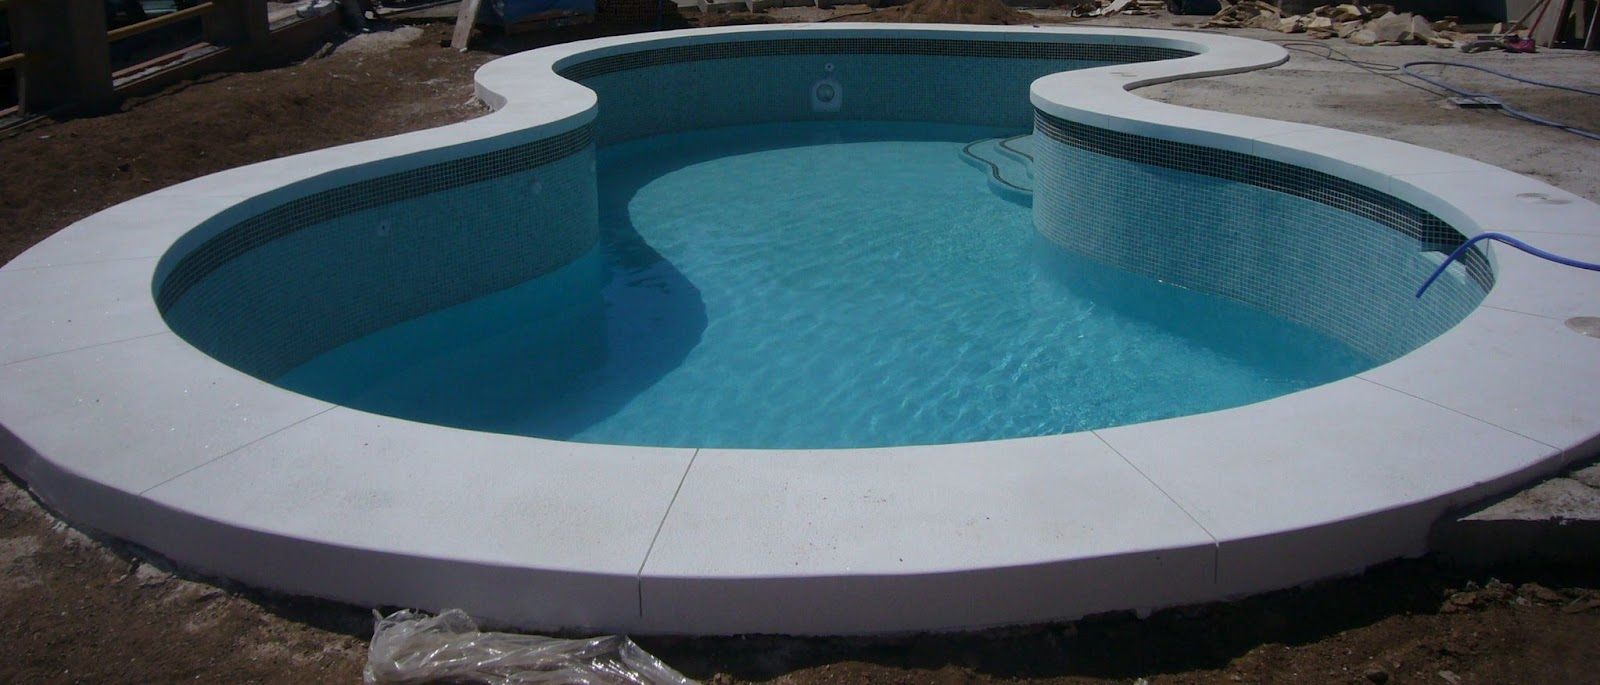 Arquisurlauro vivienda proyecto de piscina privada for Proyecto piscina privada